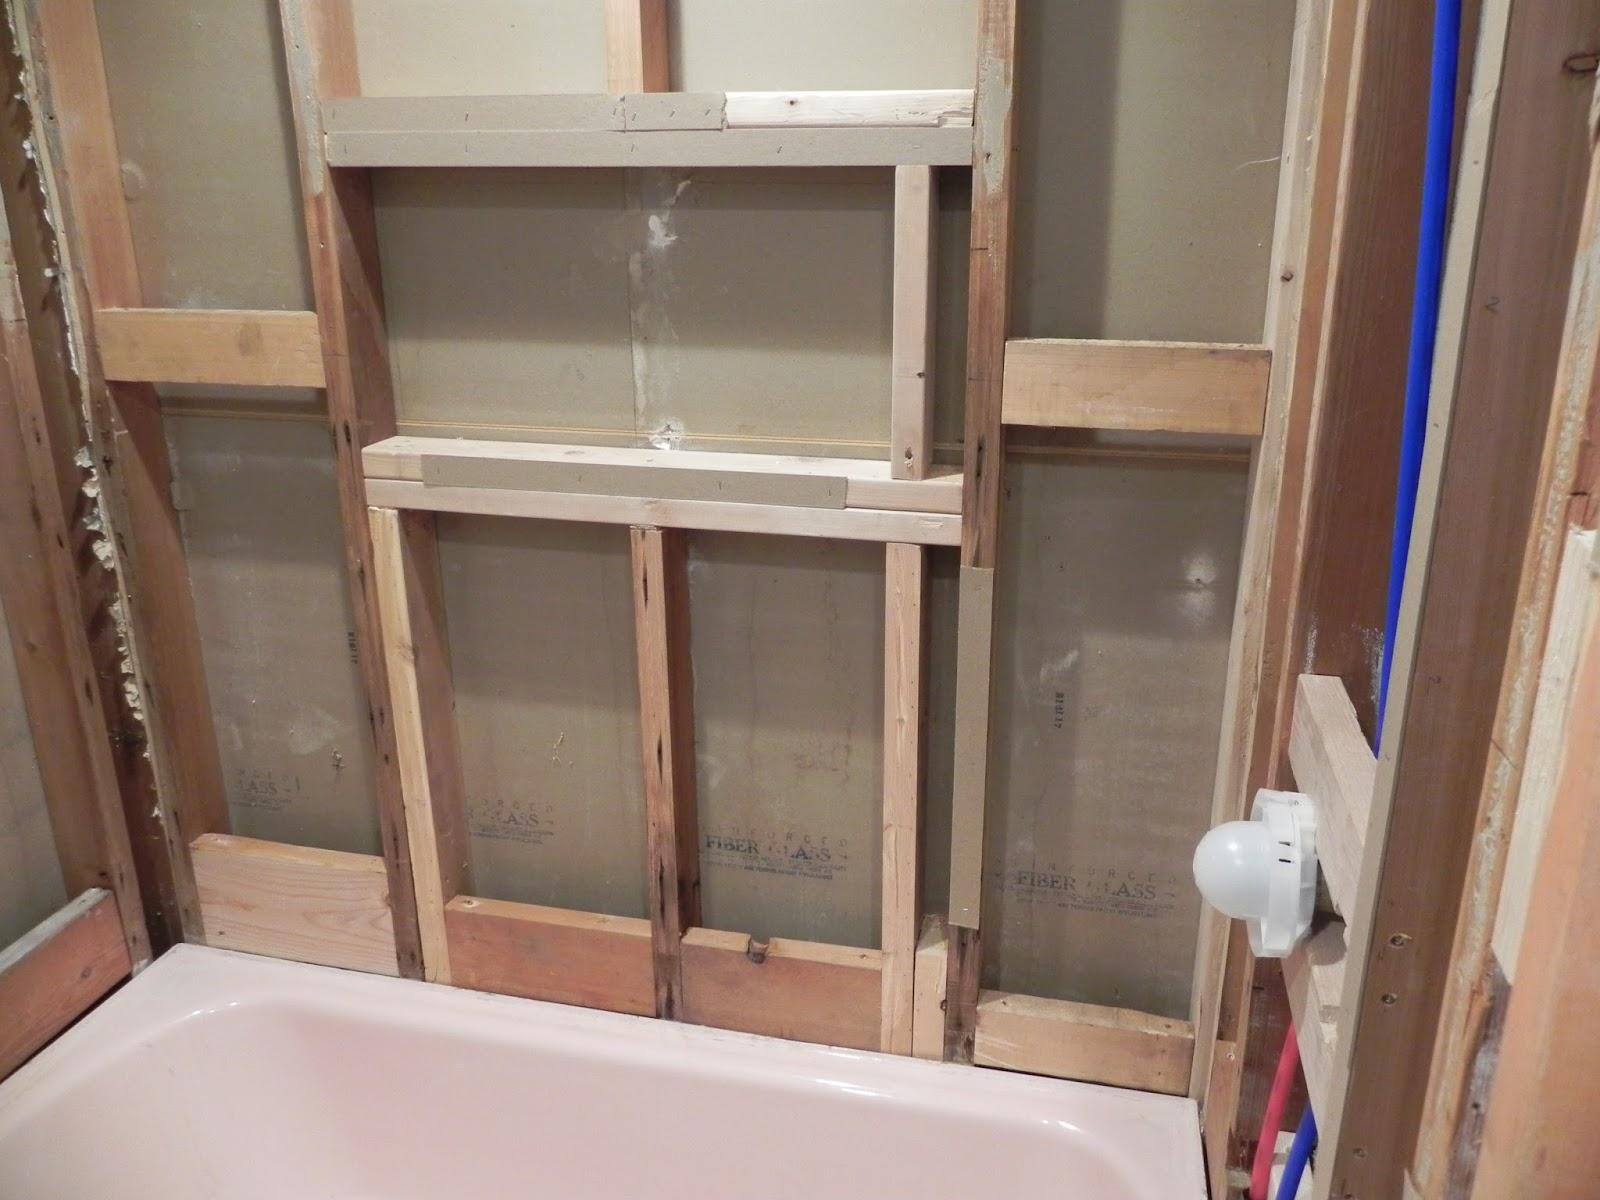 JOJILAND Bathroom Remodel Phase Next